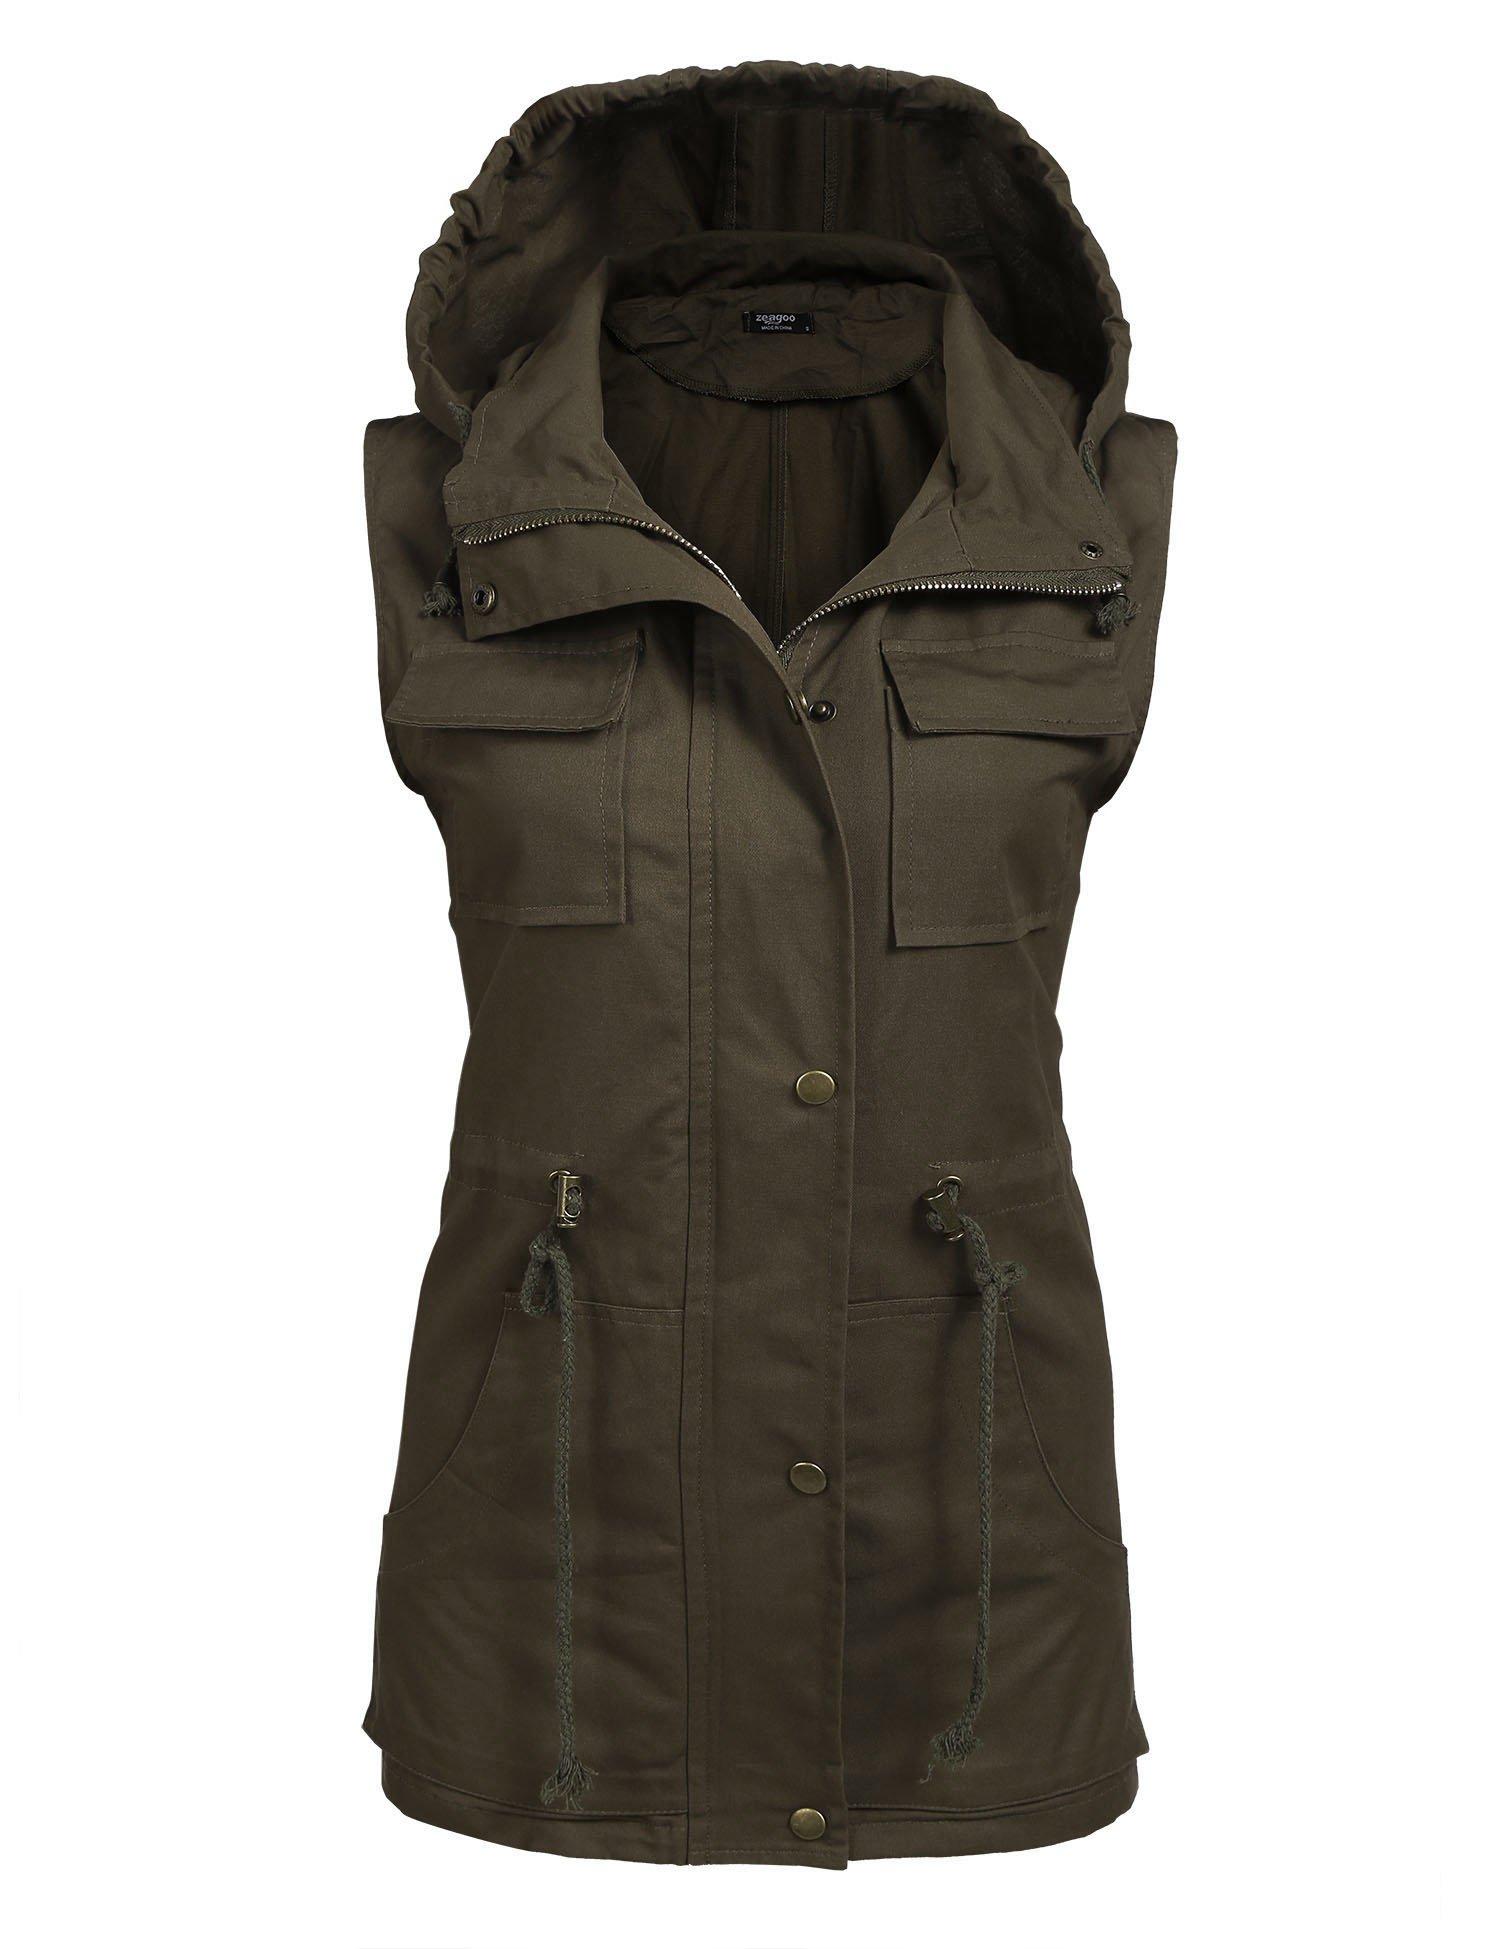 Zeagoo Womens Lightweight Sleeveless Military Anorak Vest,(A)army Green 1,X-Large